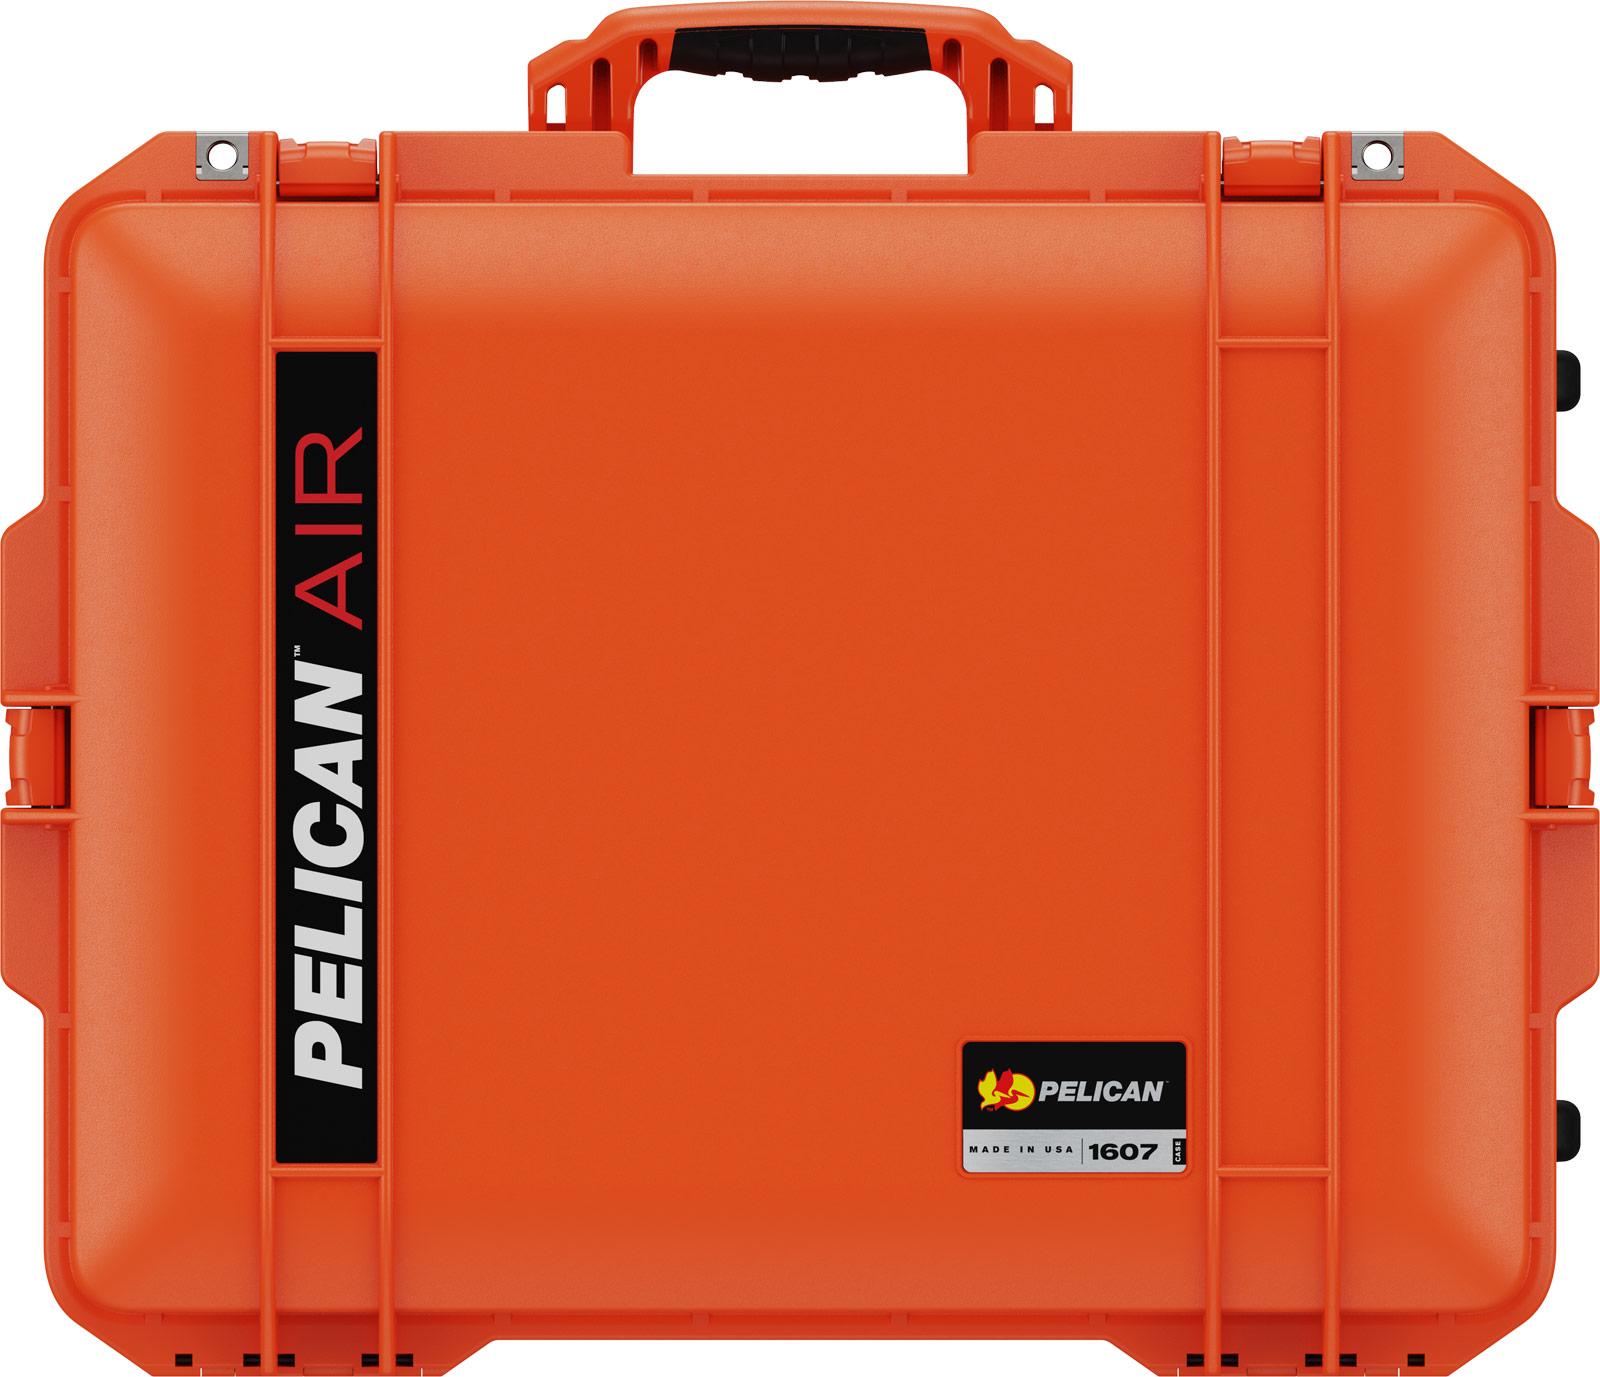 pelican 1607 orange deep protective case